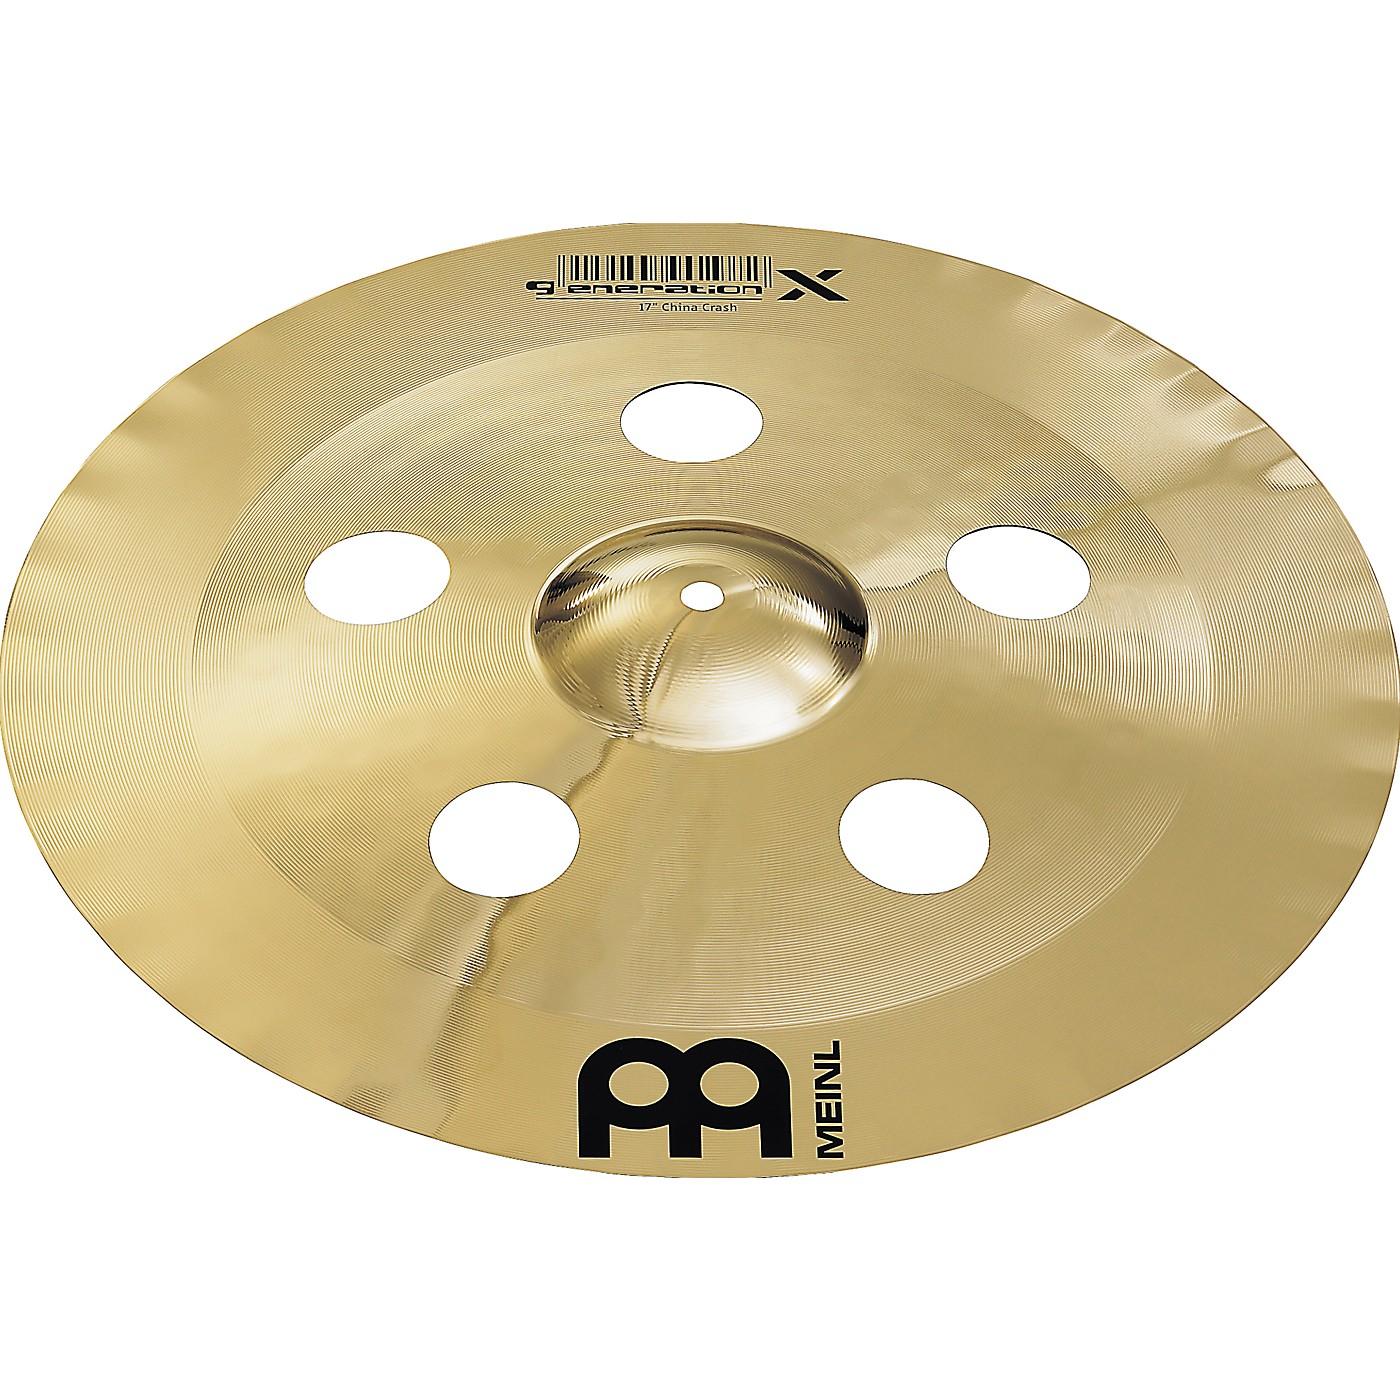 Meinl Generation X China Crash Cymbal thumbnail